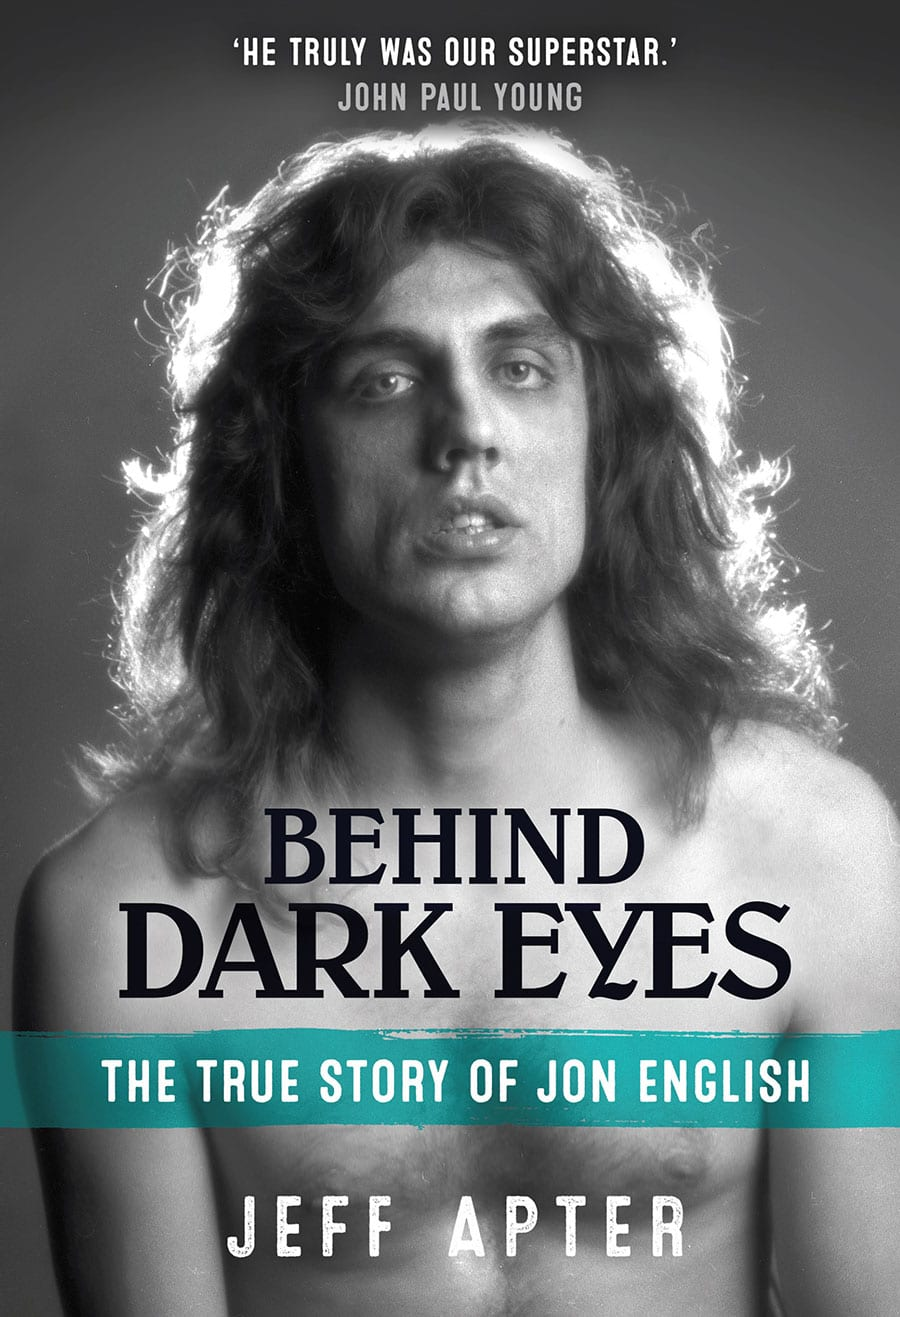 Jeff Apter book cover, Behind Dark Eyes The true story of Jon English